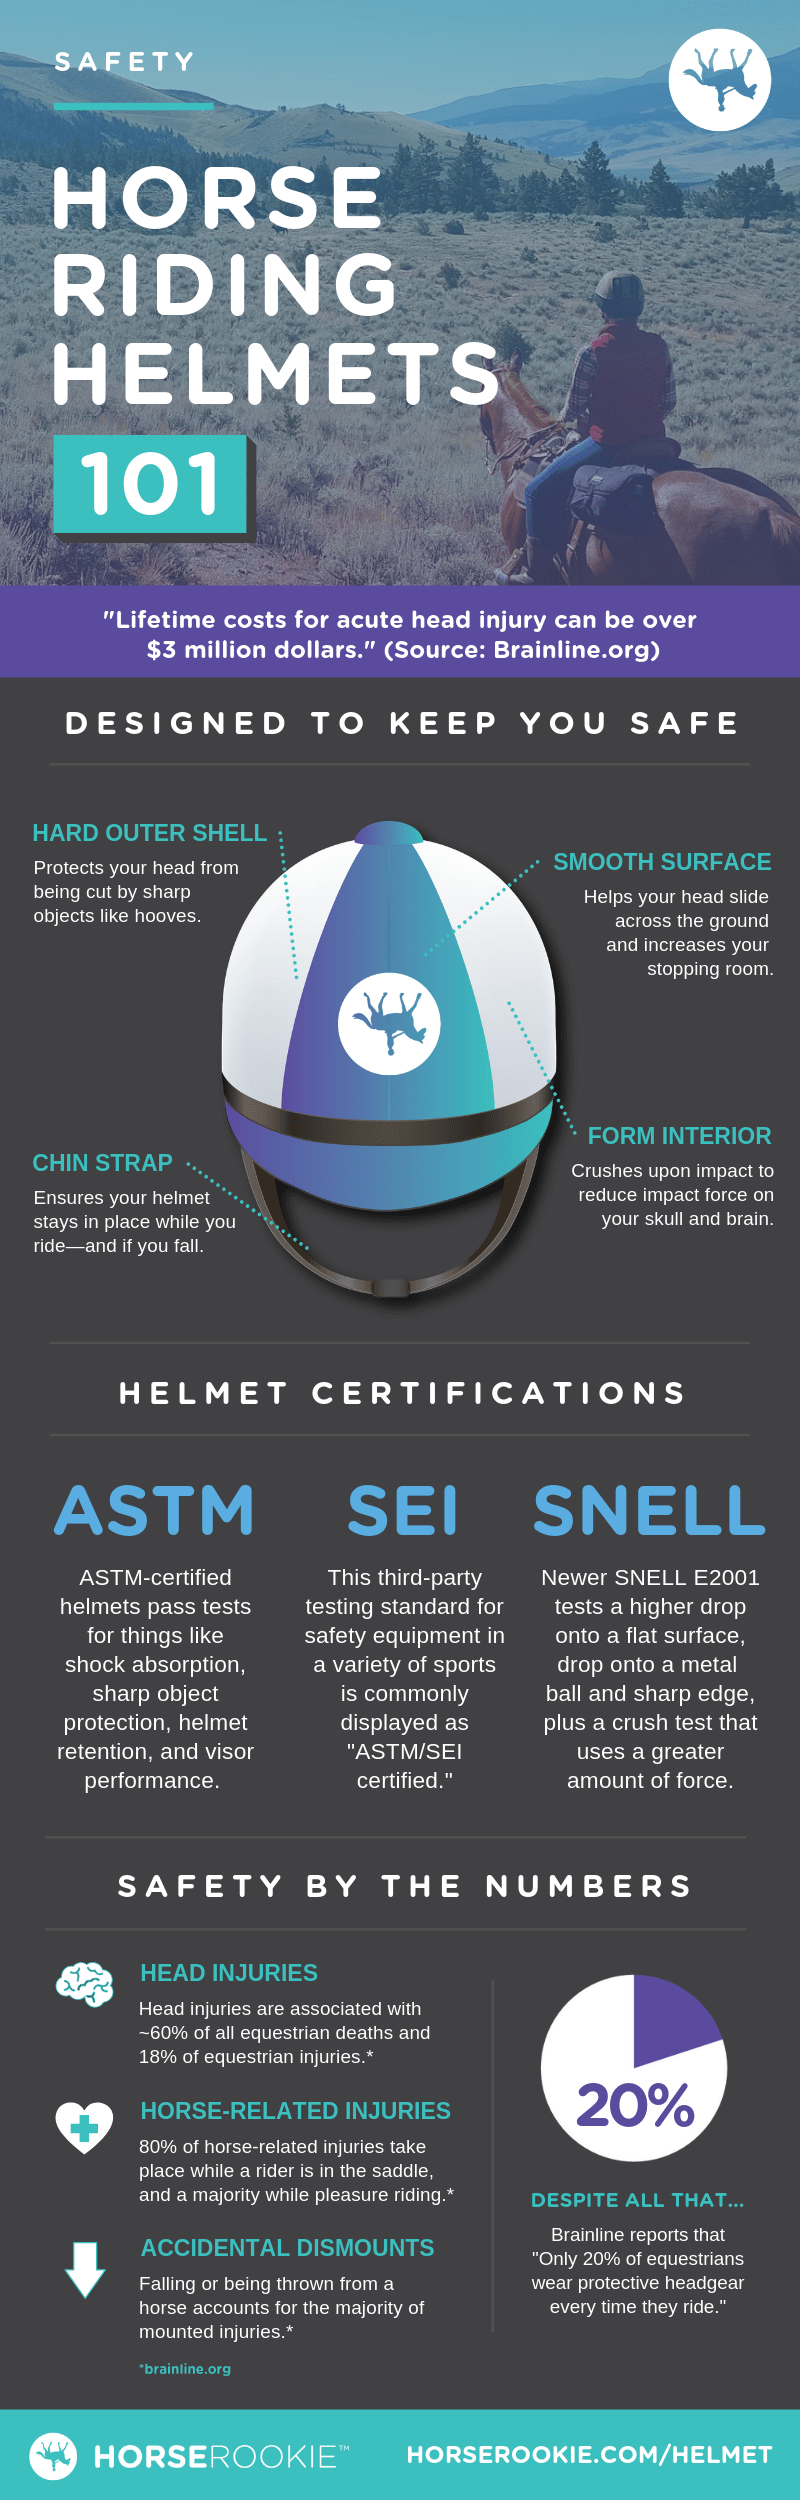 Horse Riding Helmets 101 Infographic